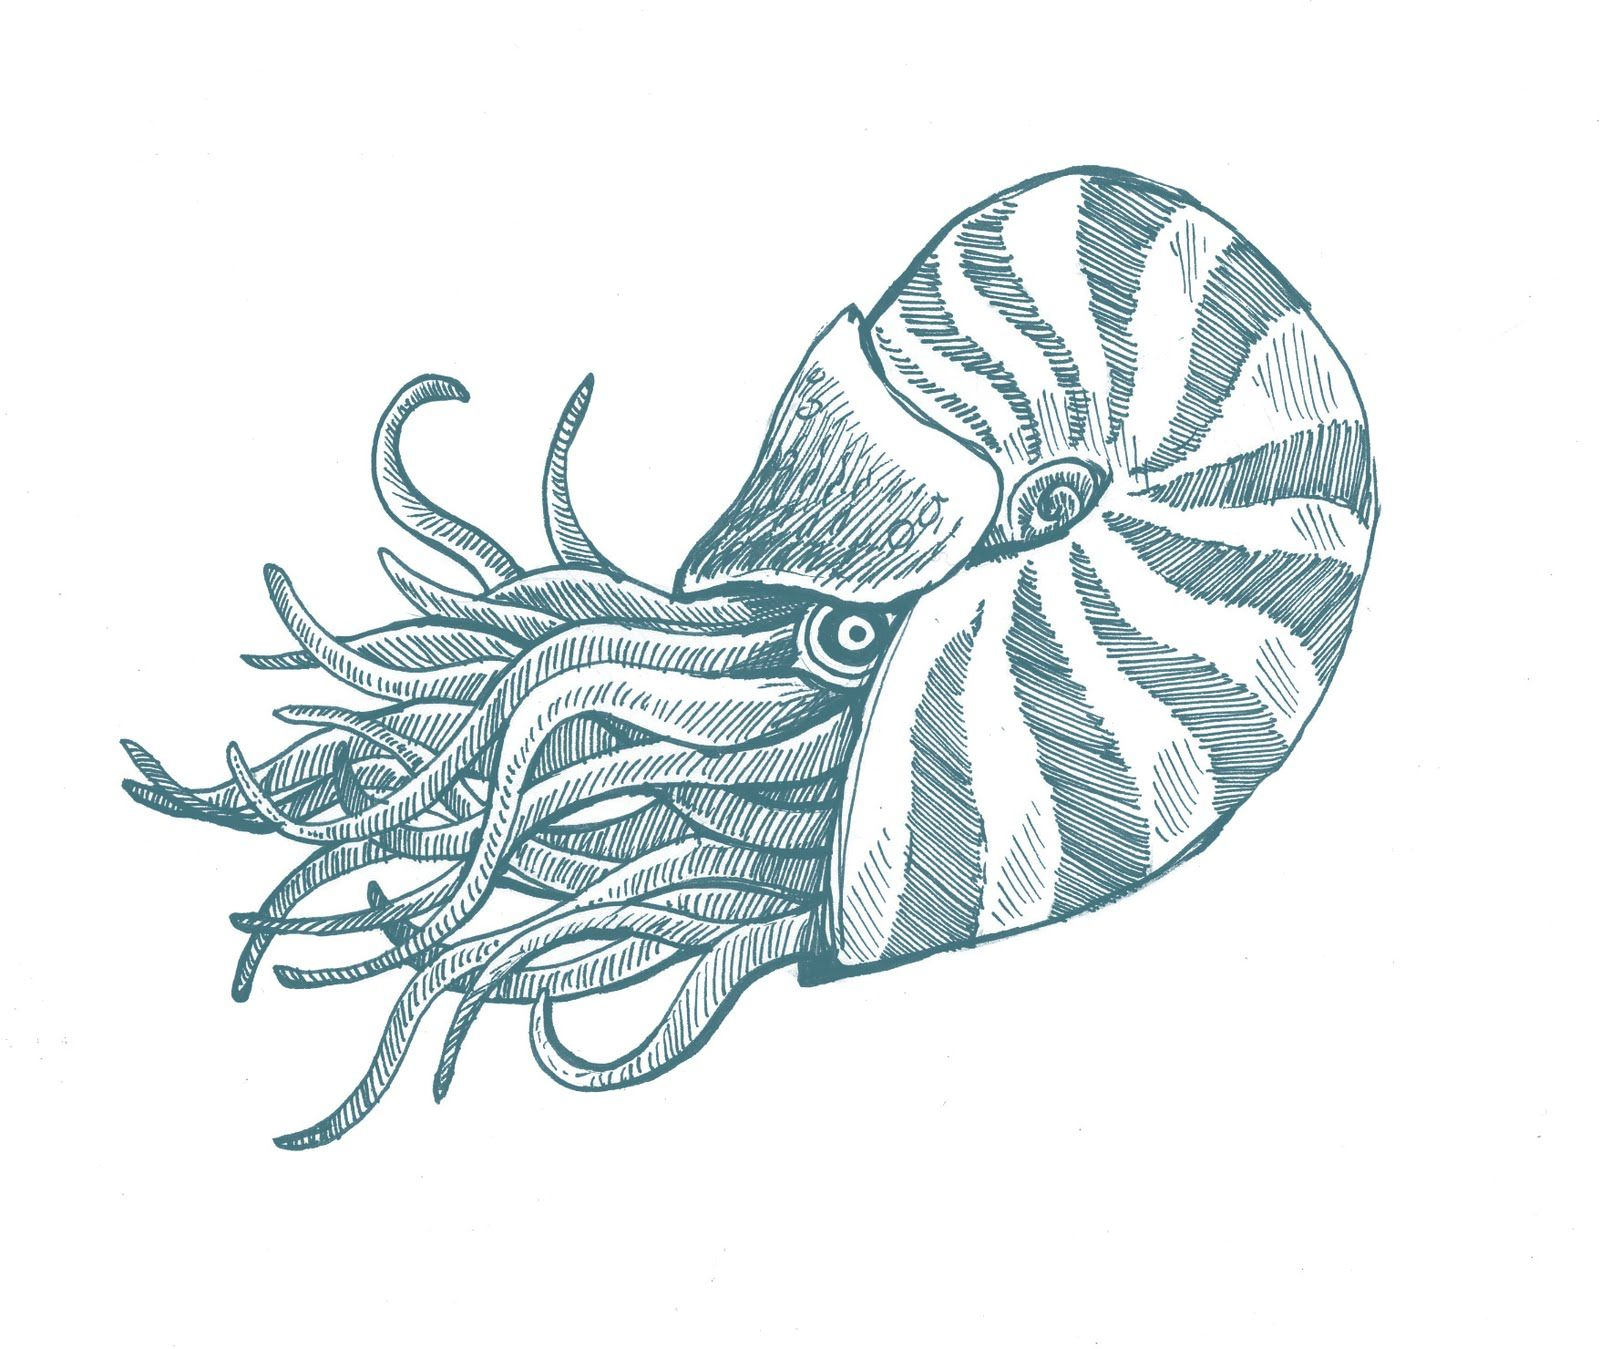 Sea Creature Drawings Tuesday, June 1, 2010 Sea